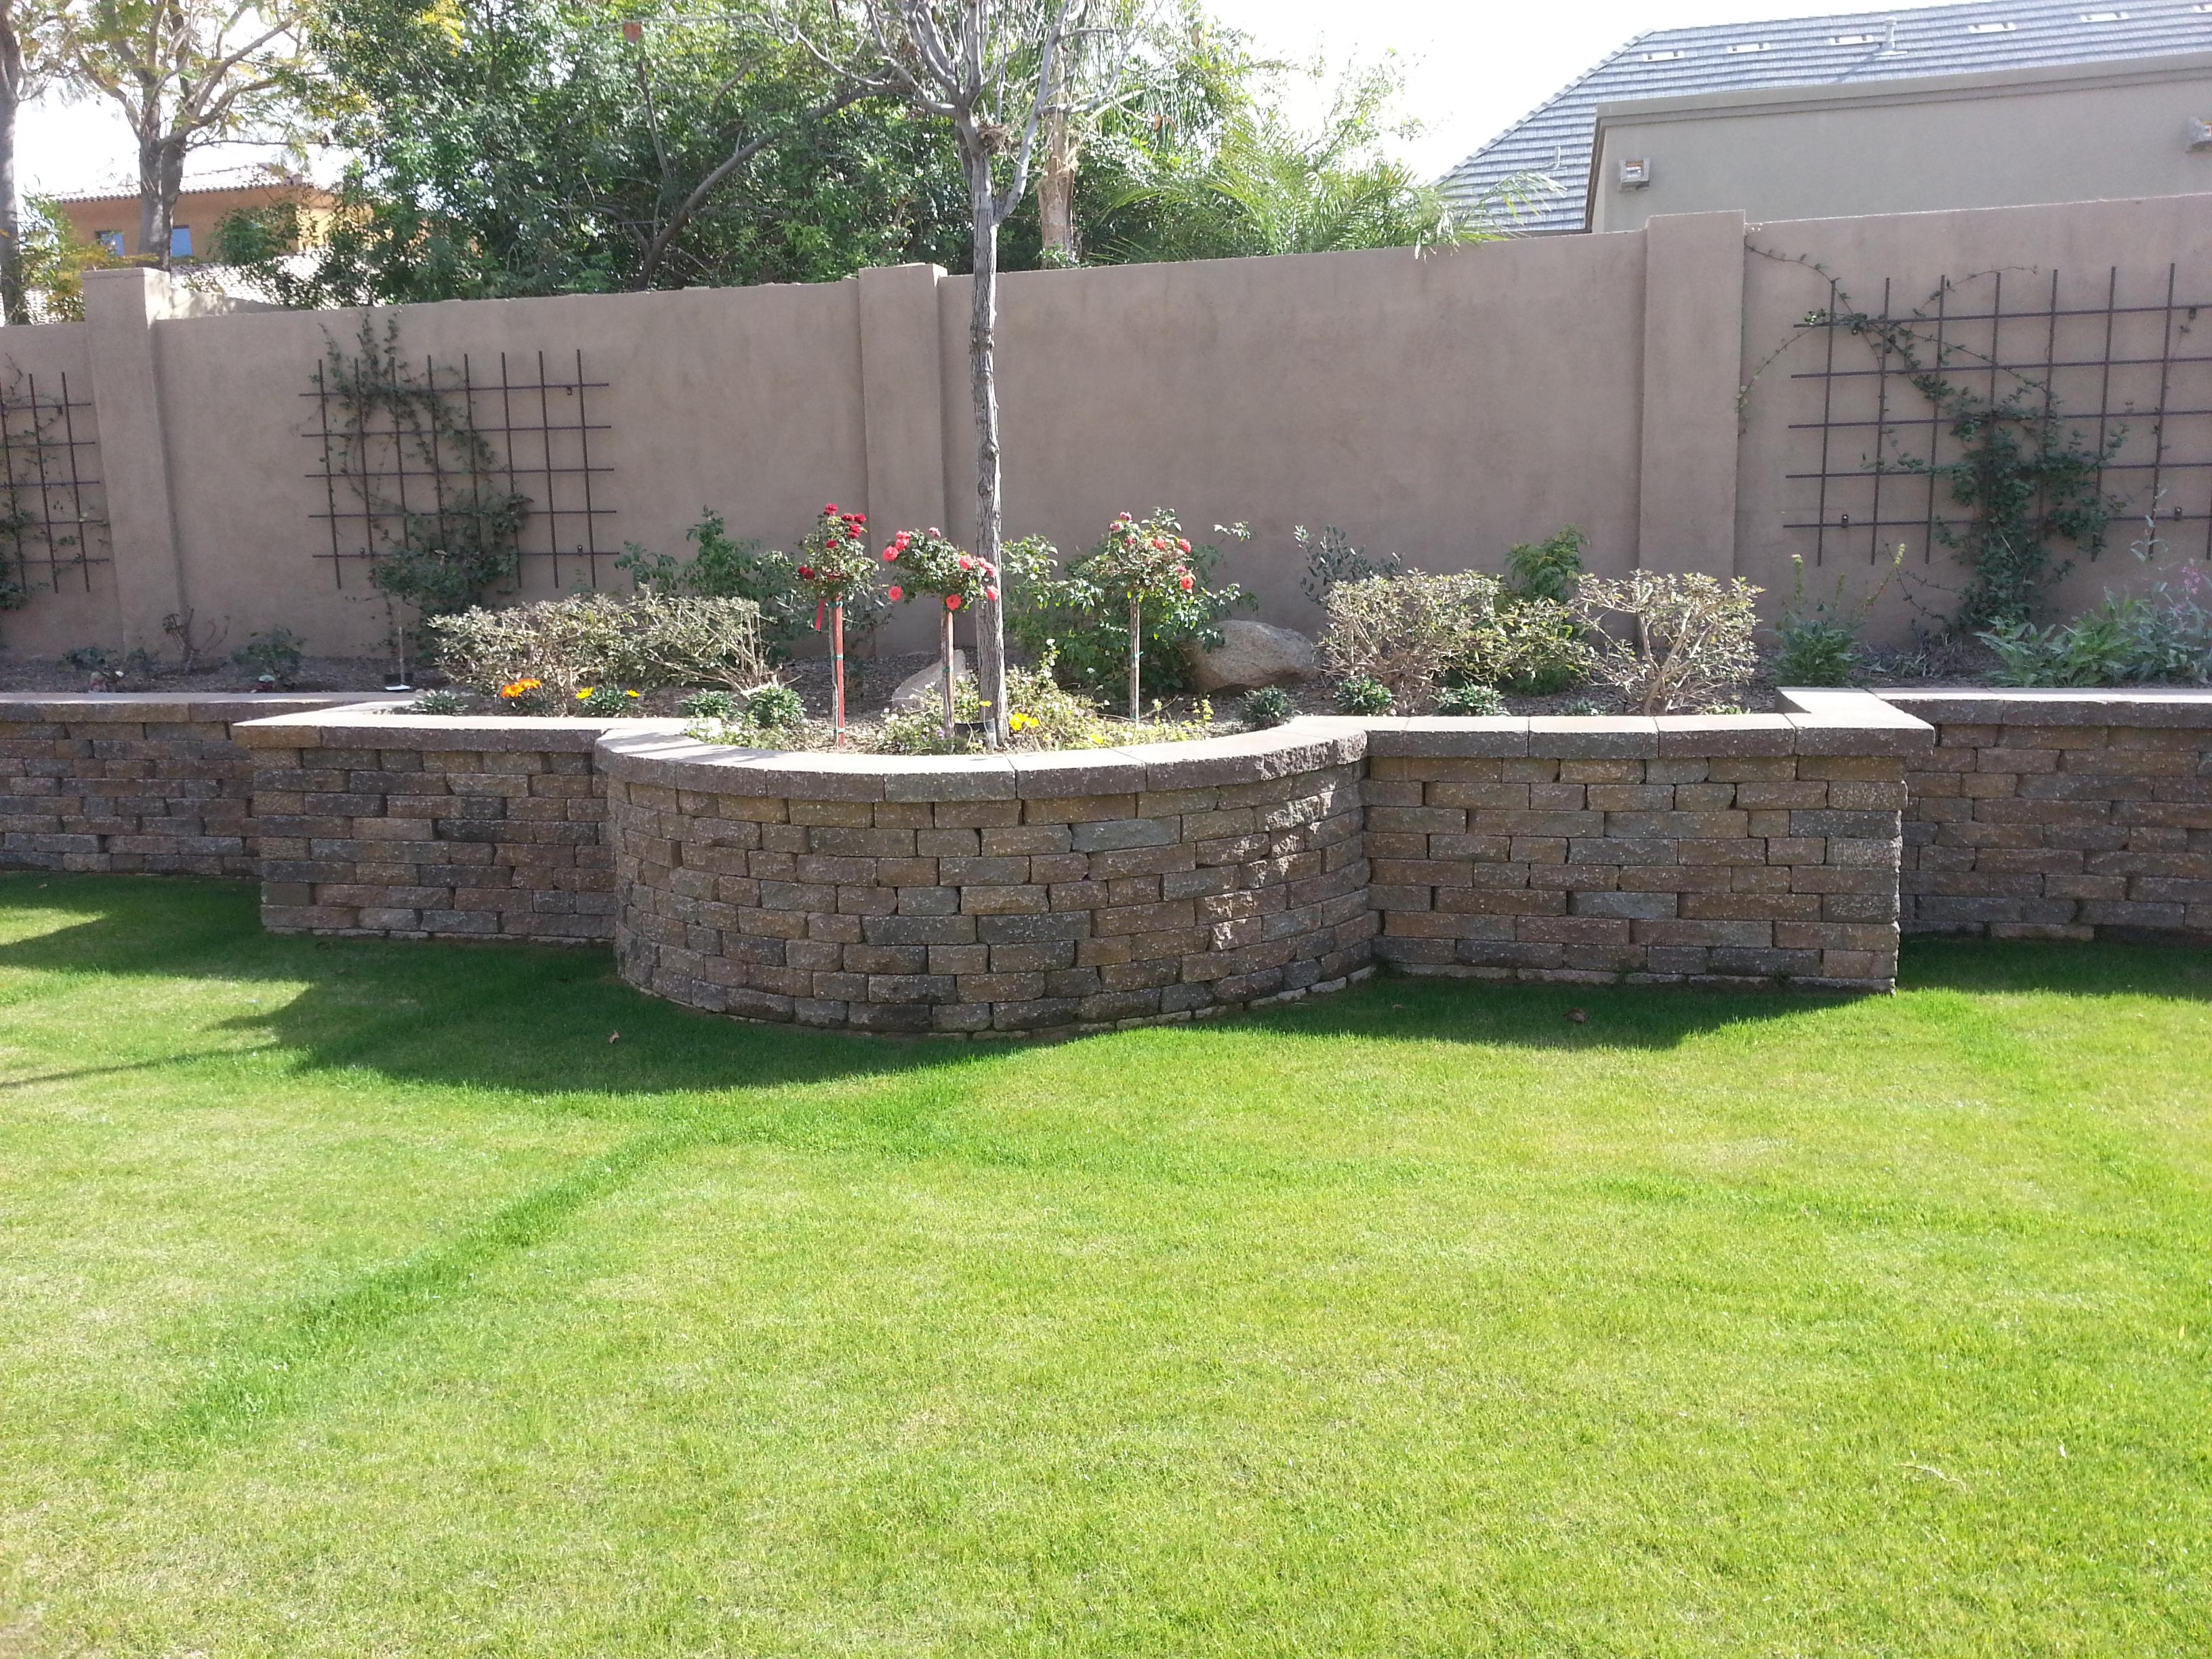 Walls e l m landscaping design inc for Landscaping rock queen creek az